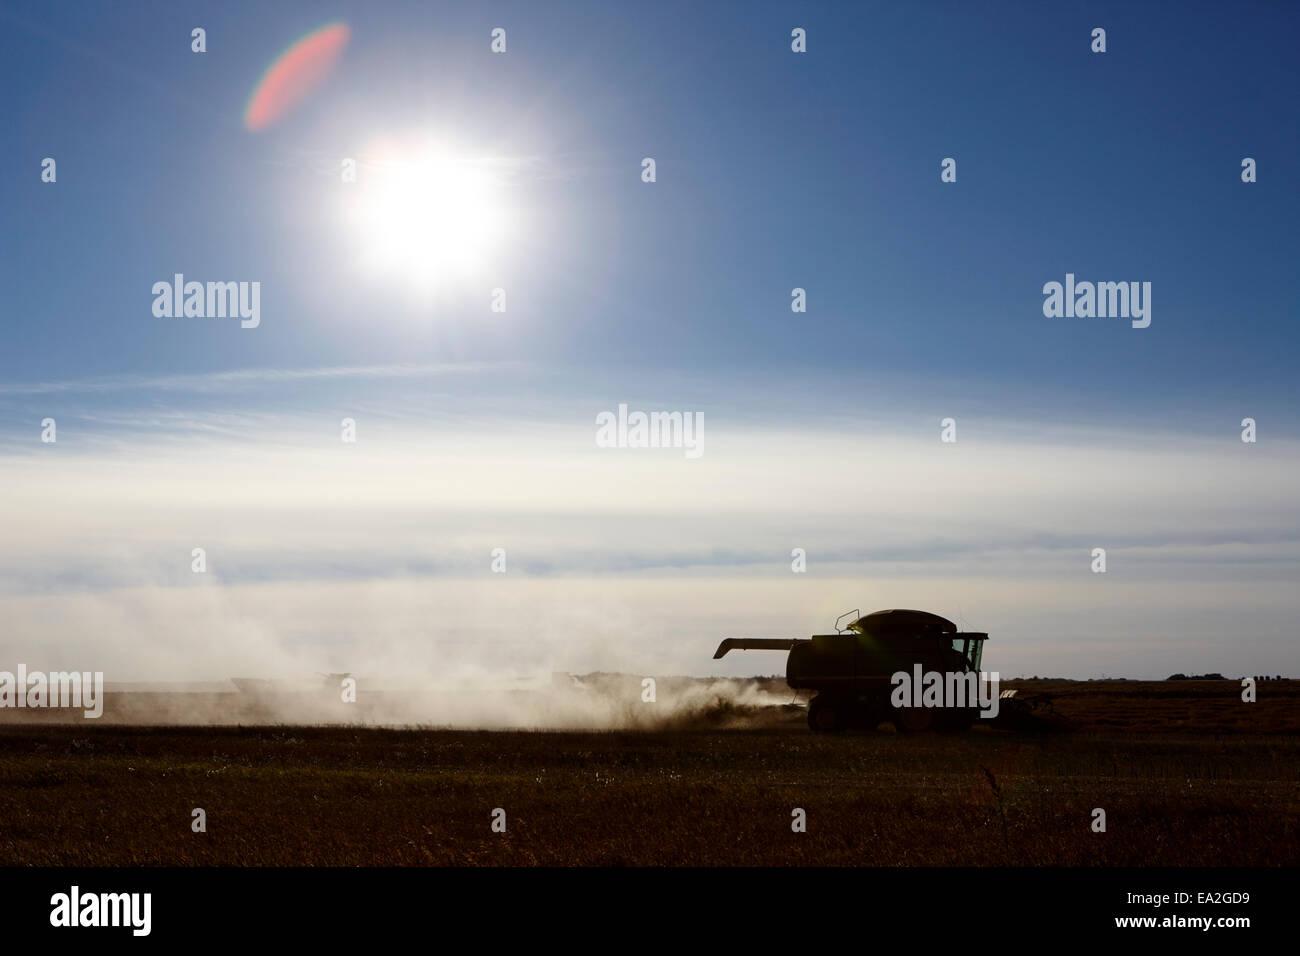 john deere combine harvesters harvesting on the prairies of Saskatchewan Canada - Stock Image